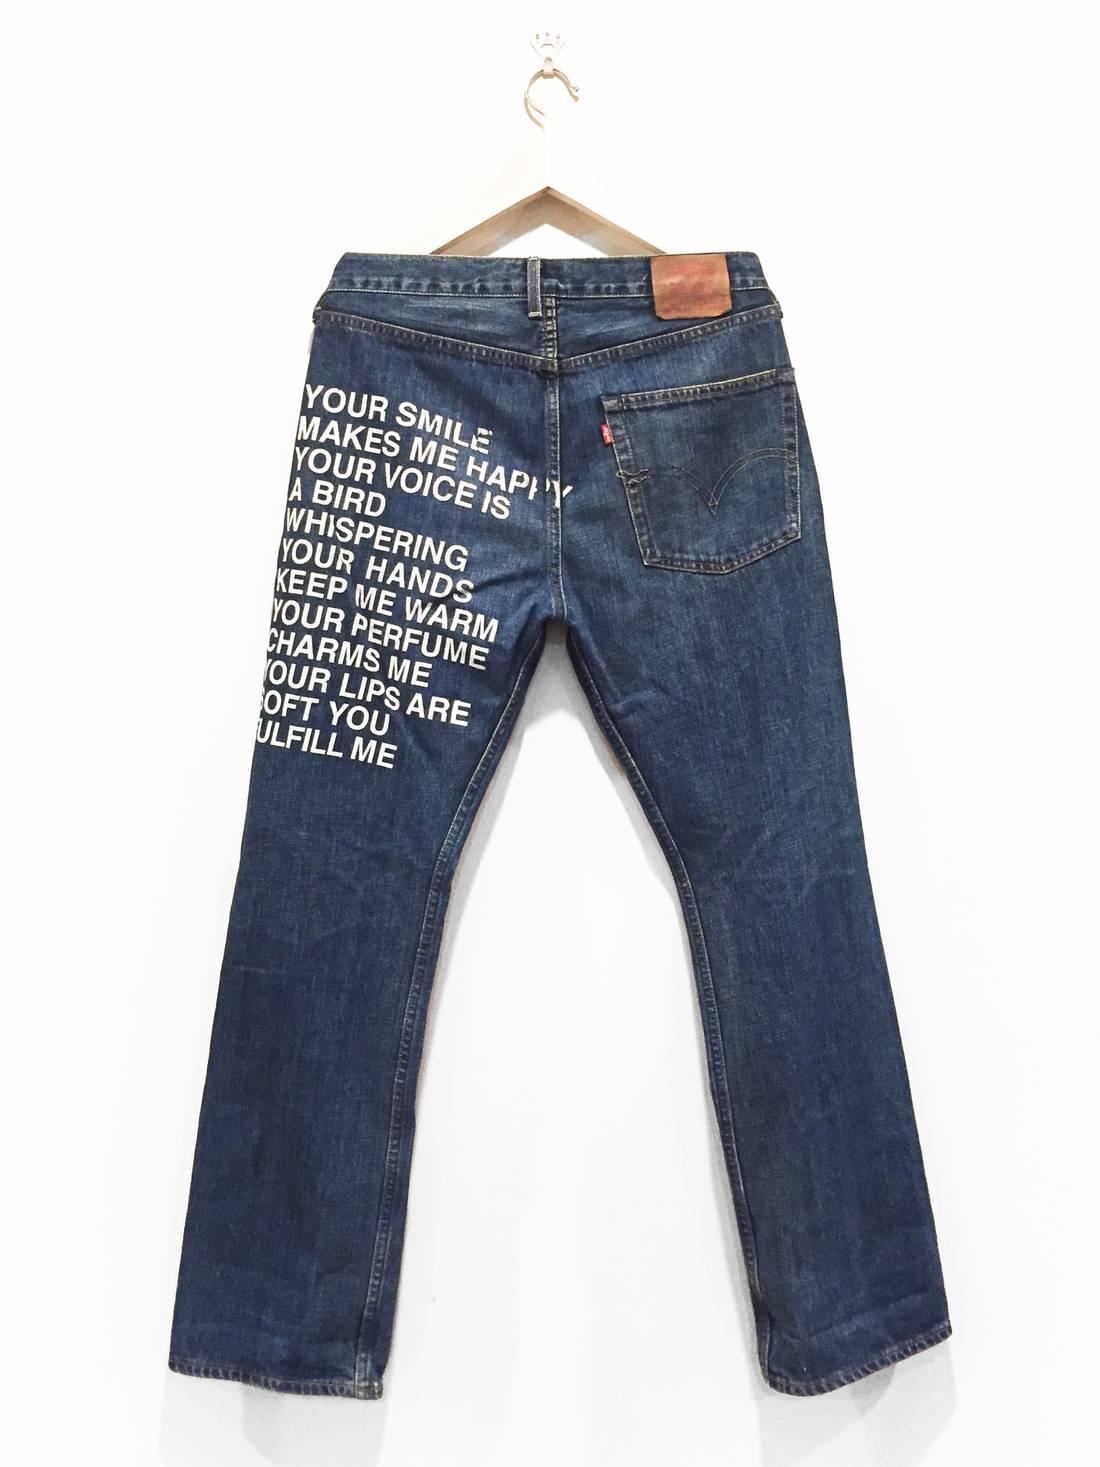 DENIM - Denim trousers Poems 88O5aN